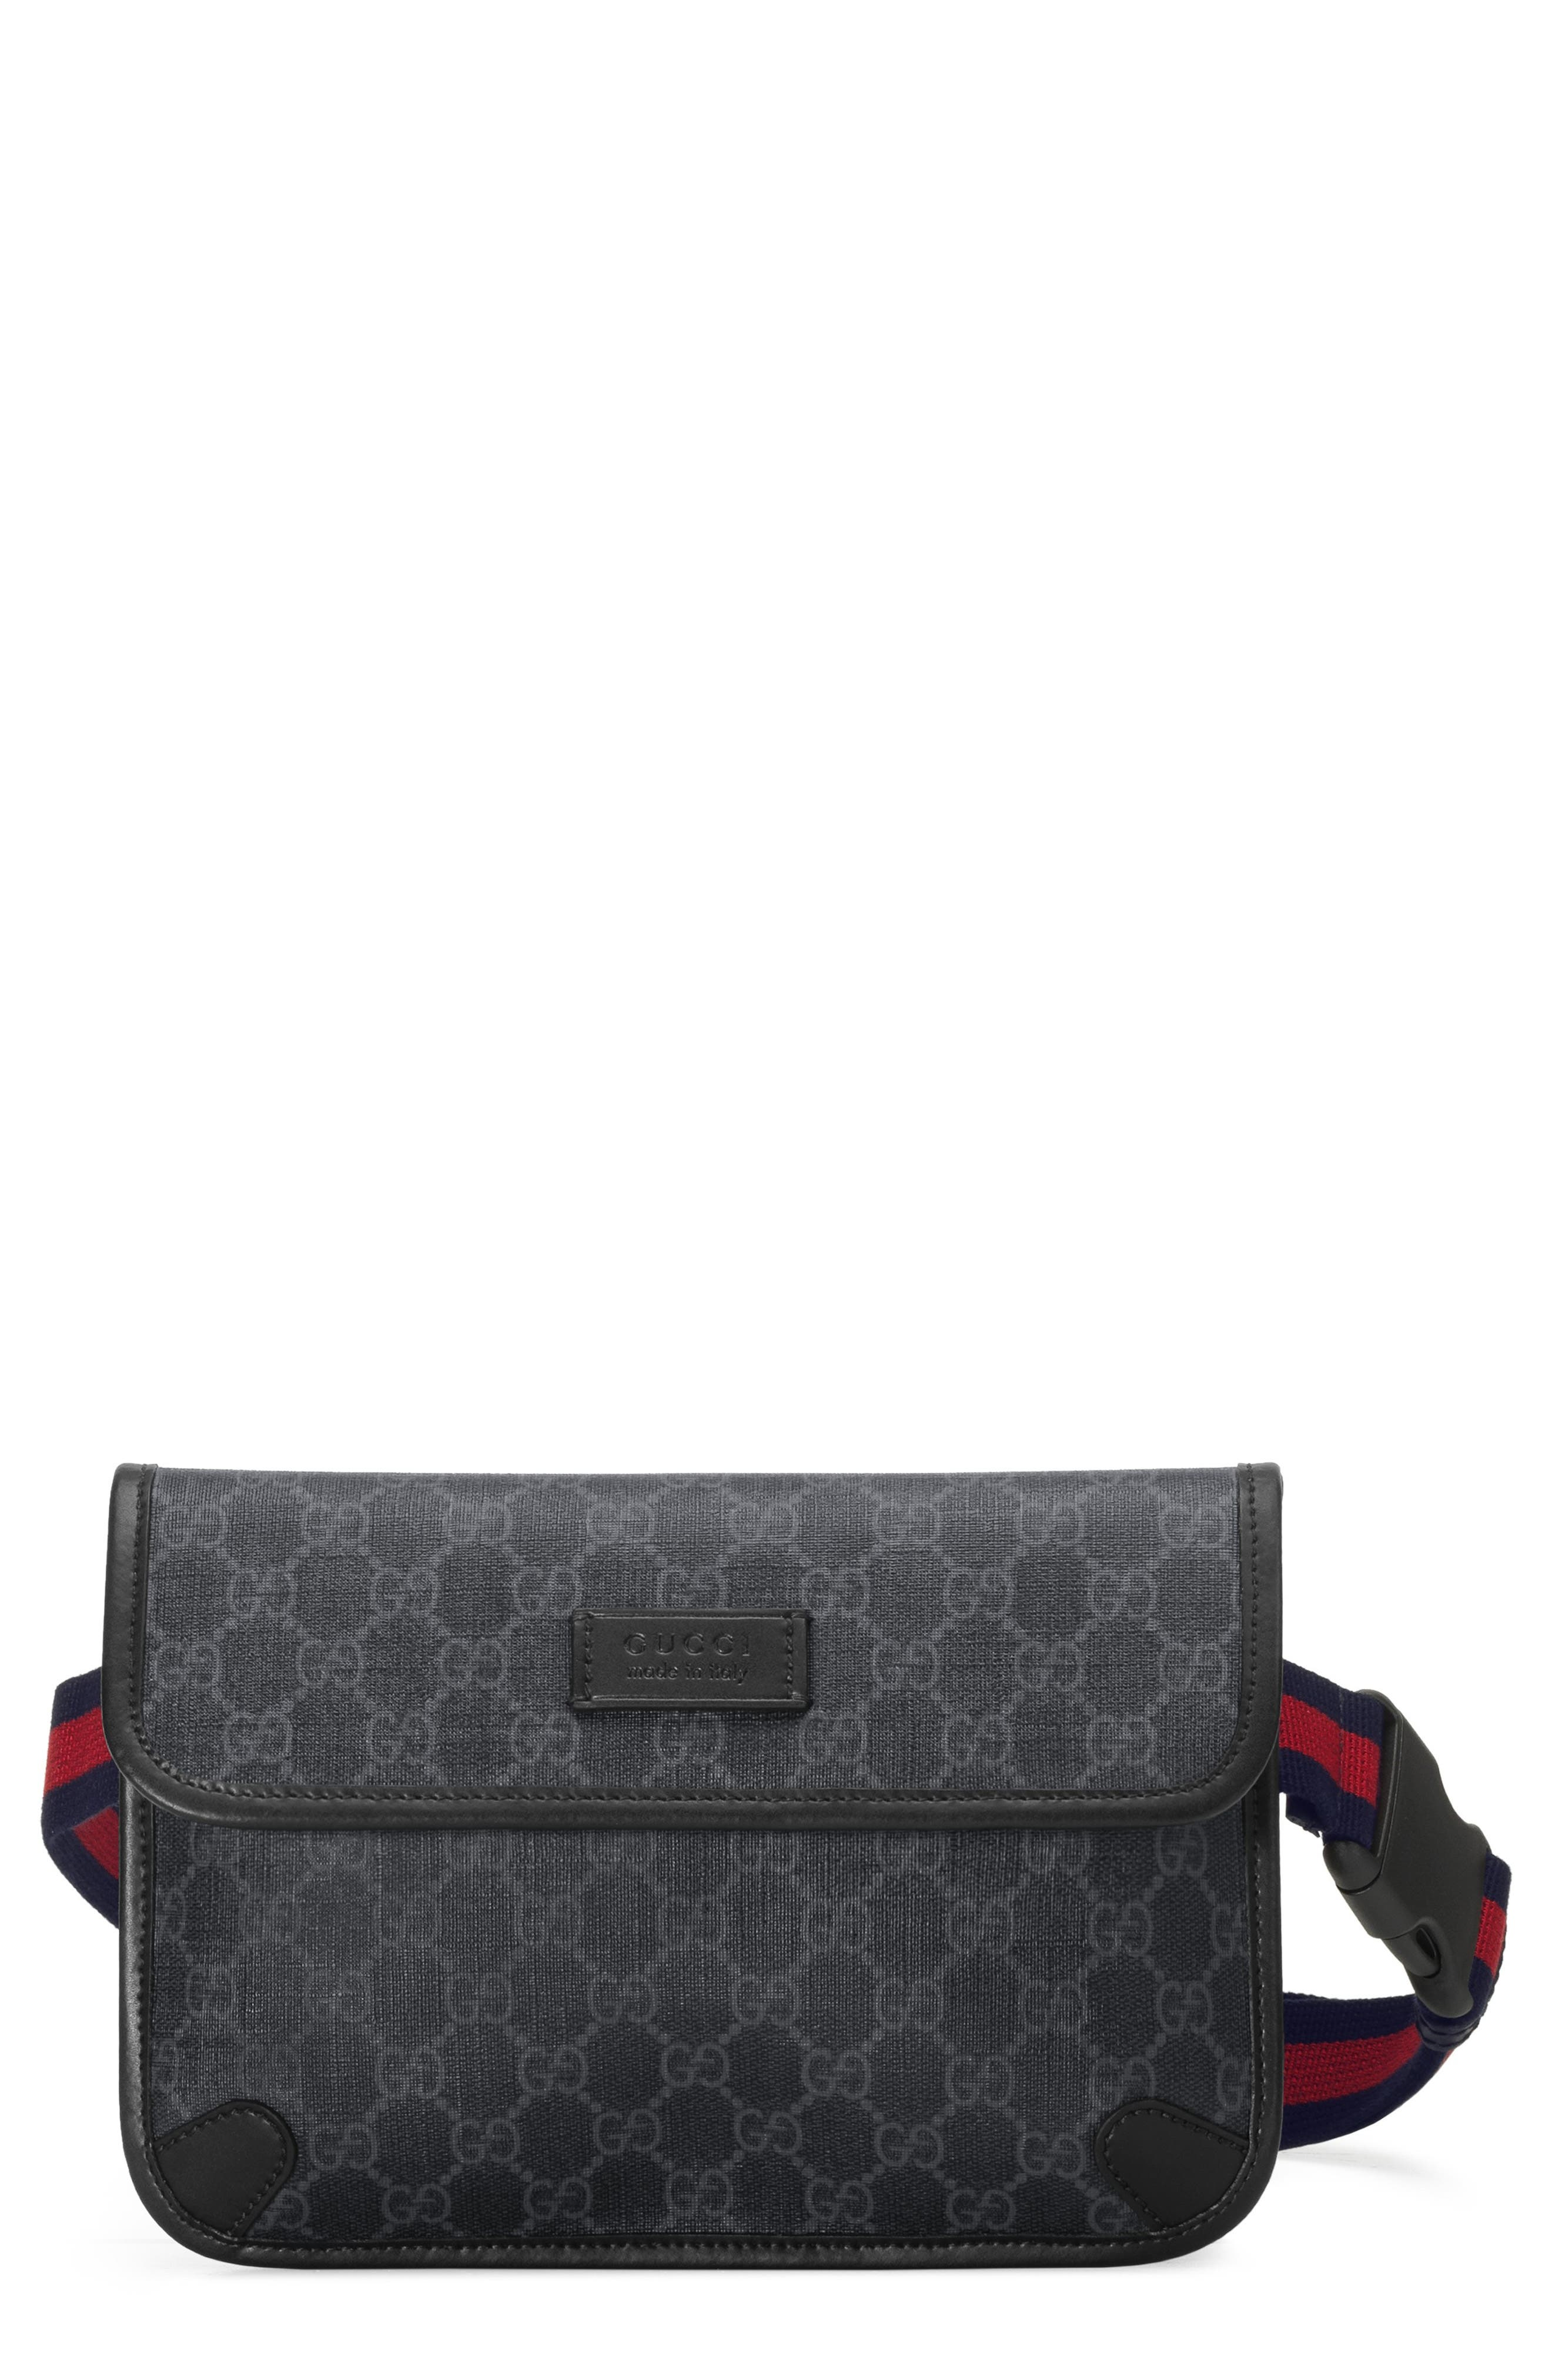 Gucci Belt GG Supreme Belt Bag